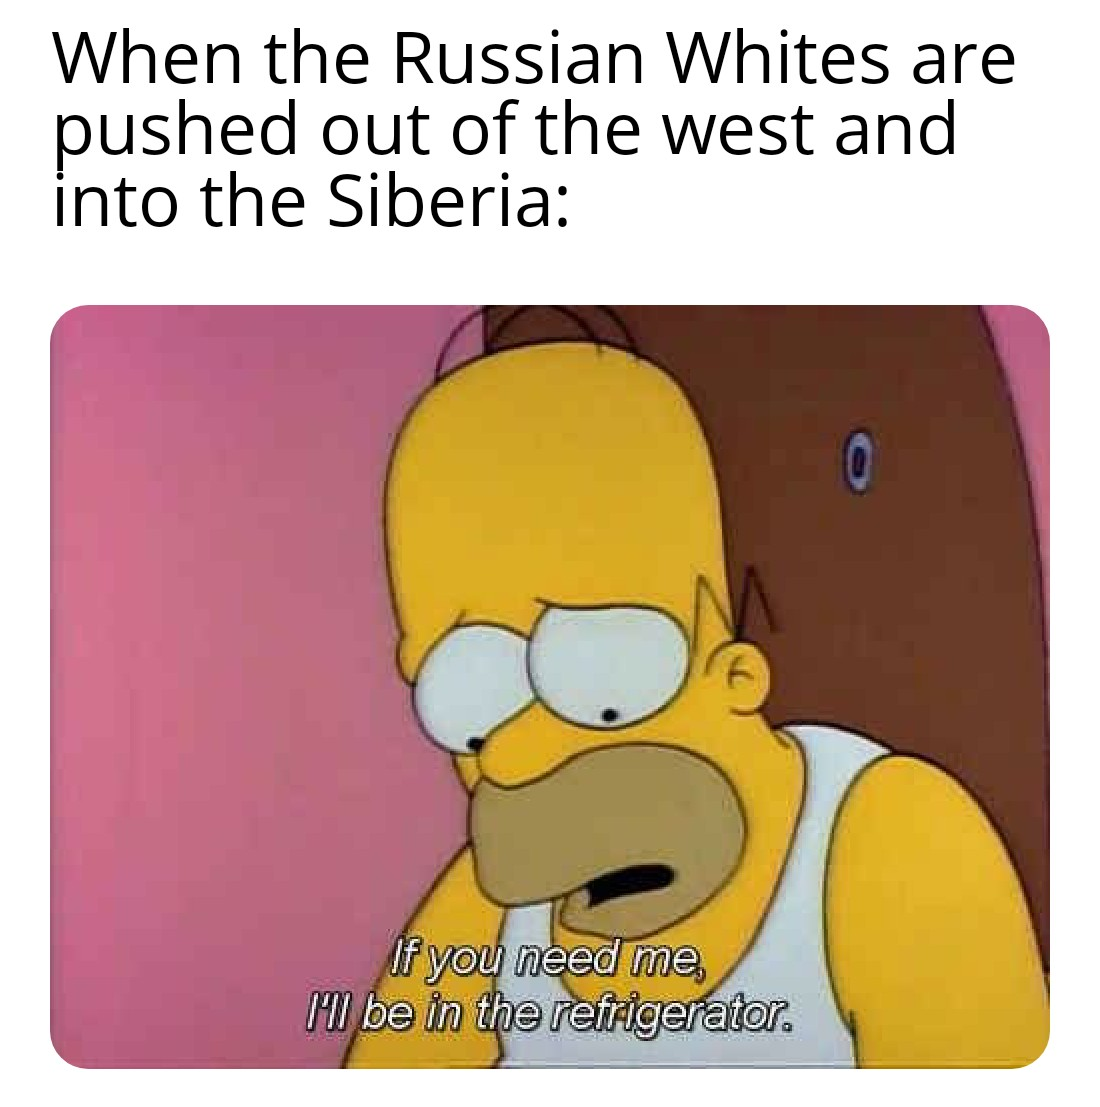 Ah shit, here we go again - memes